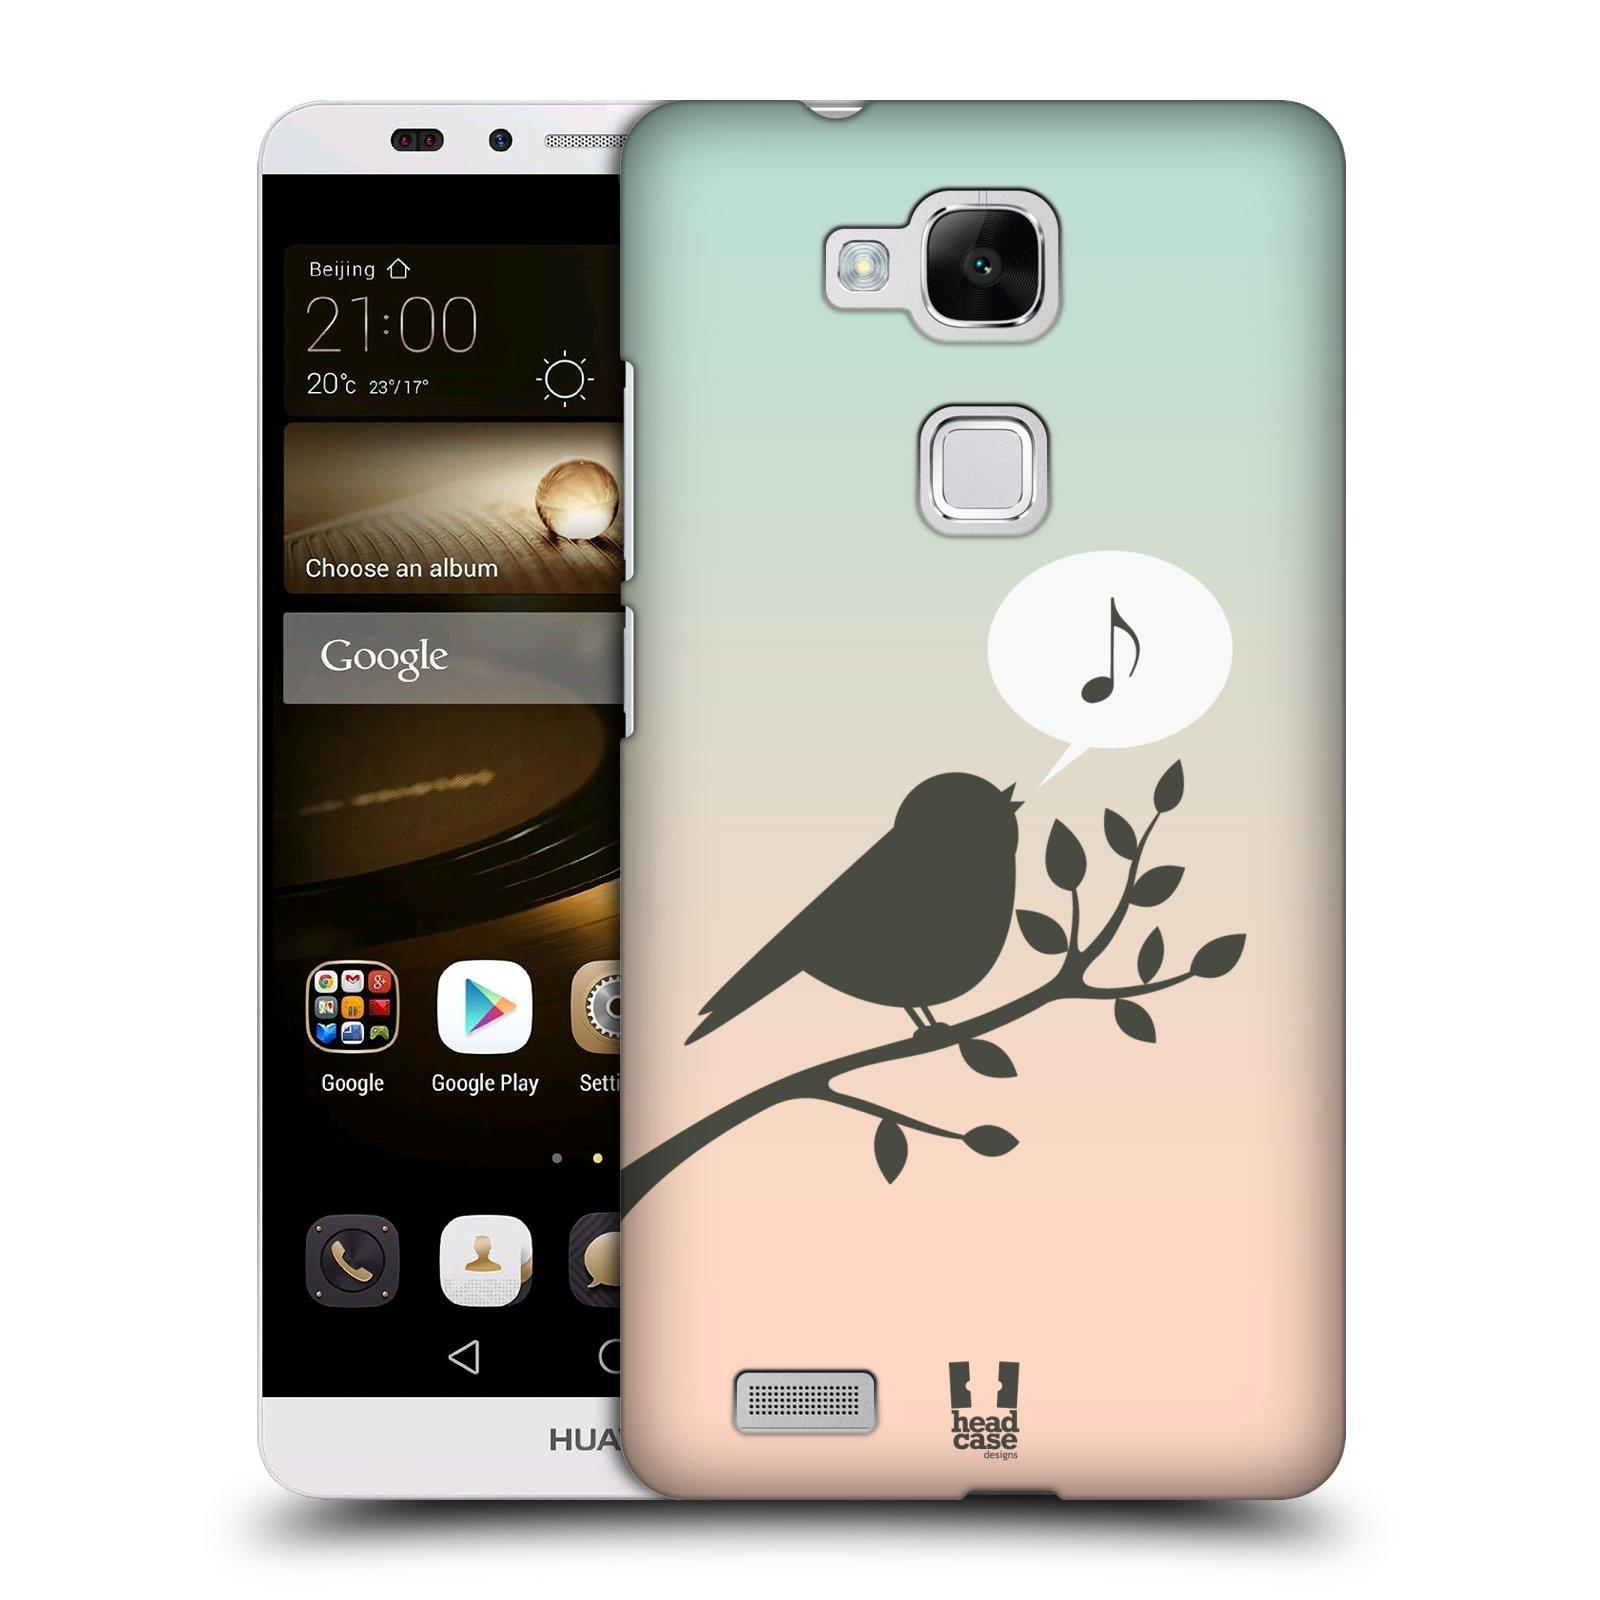 HEAD CASE plastový obal na mobil Huawei Mate 7 vzor Ptáček zpěváček noty píseň